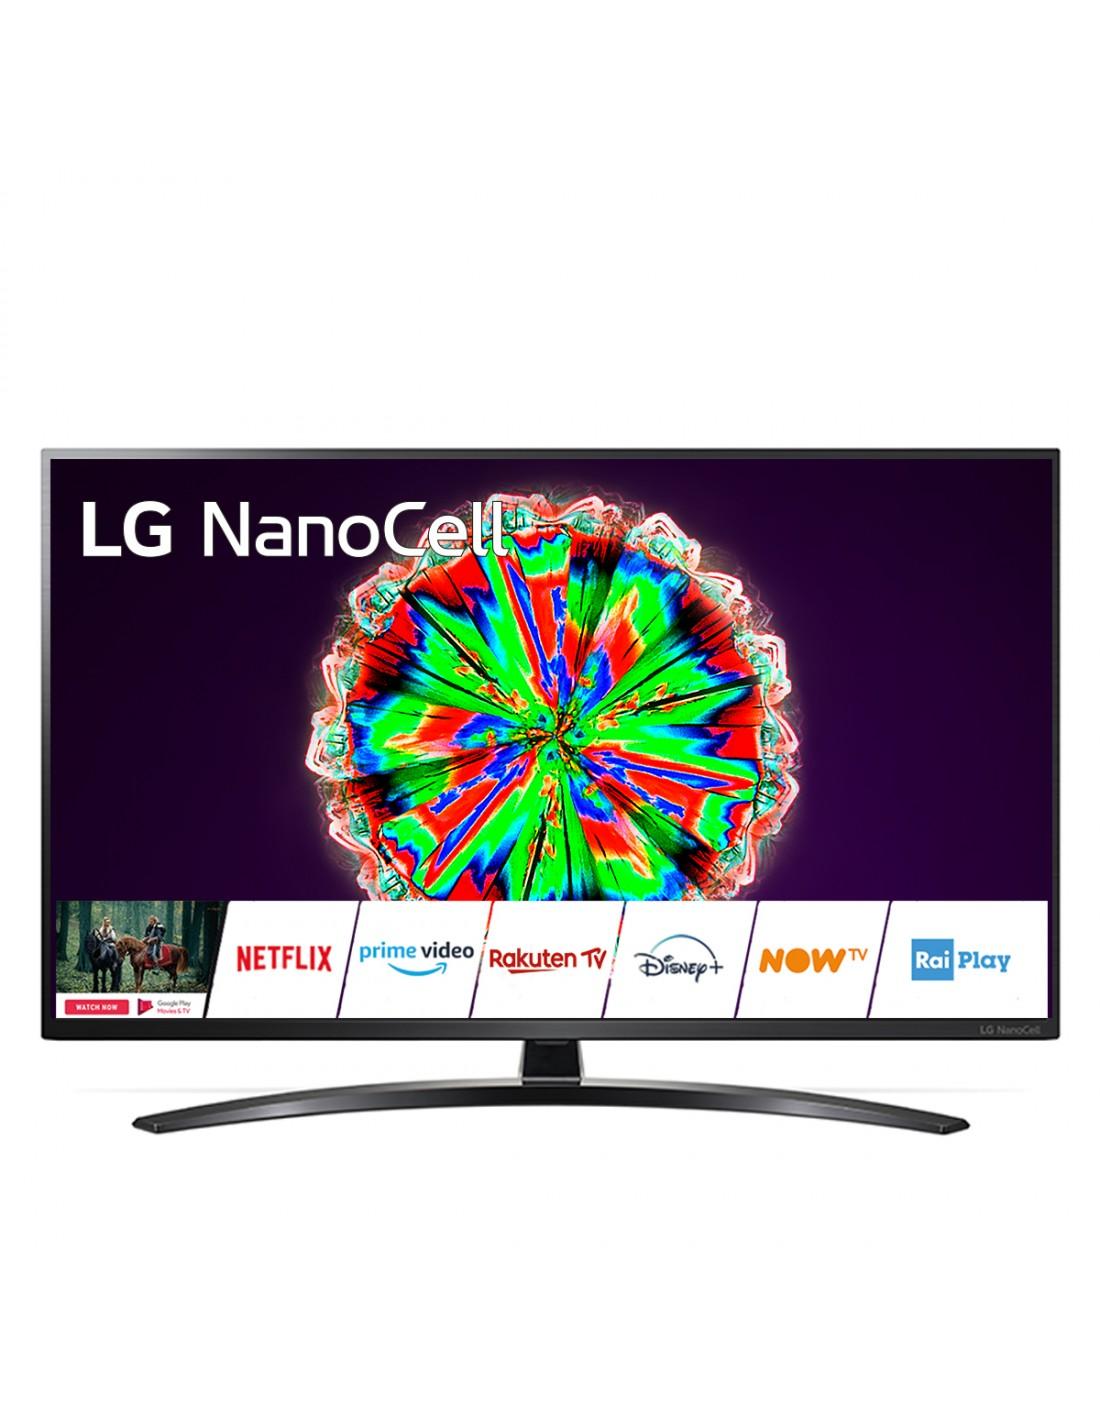 Lg Nanocell 43nano796ne Api Tv 109 2 Cm 43 4k Ultra Hd Smart Tv